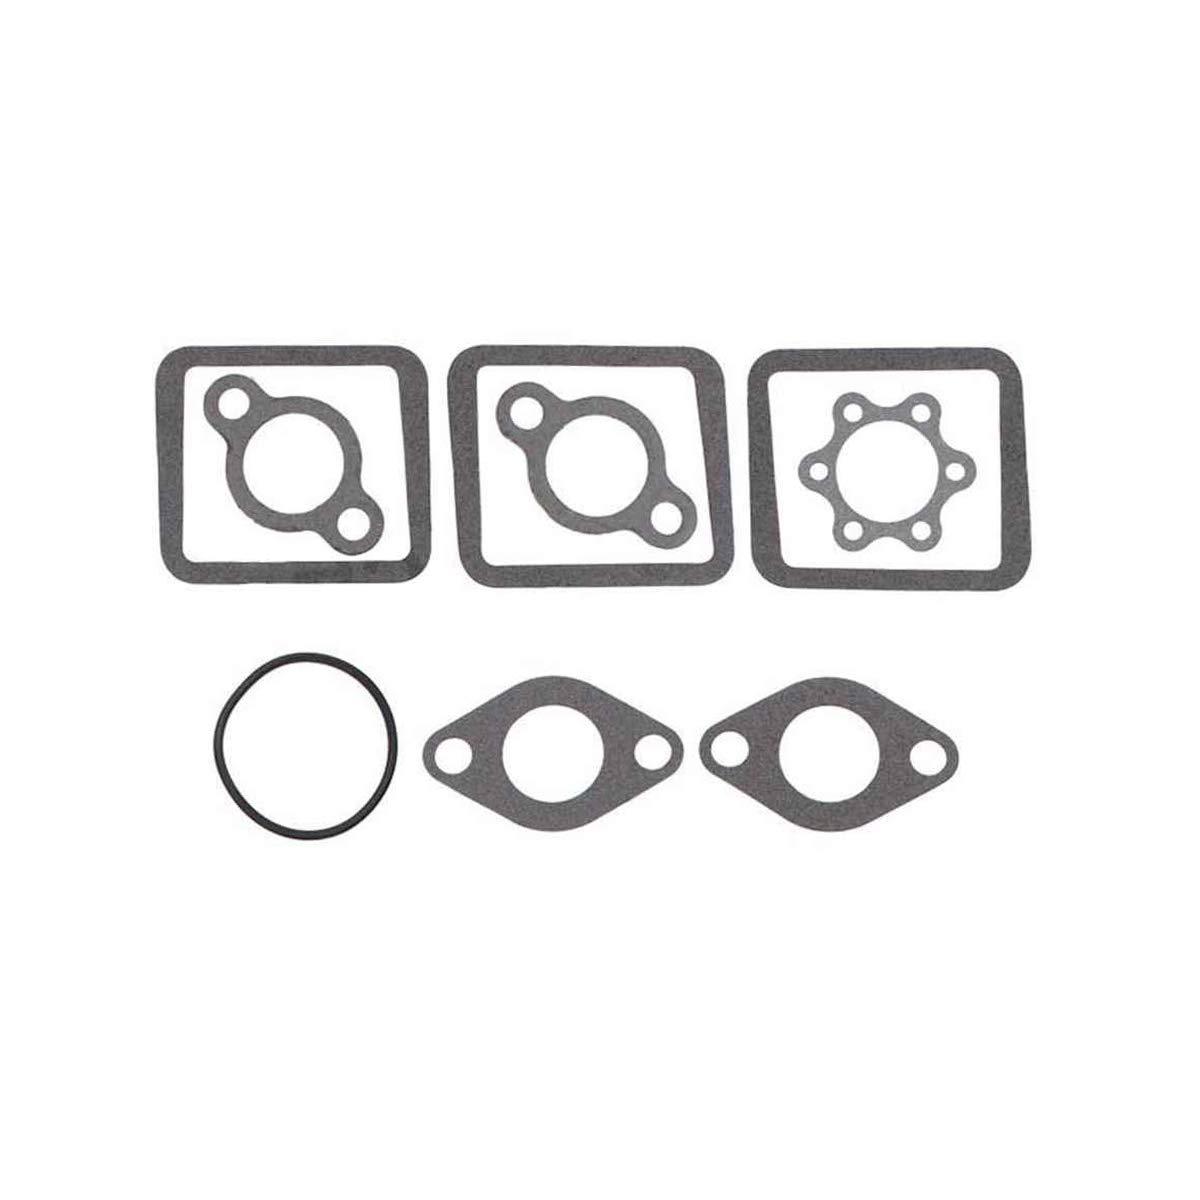 AUTVAN Valve Grind Head Gasket Set for Onan BF-B43-48 P216 P218 P220 Engine 110-3181 New